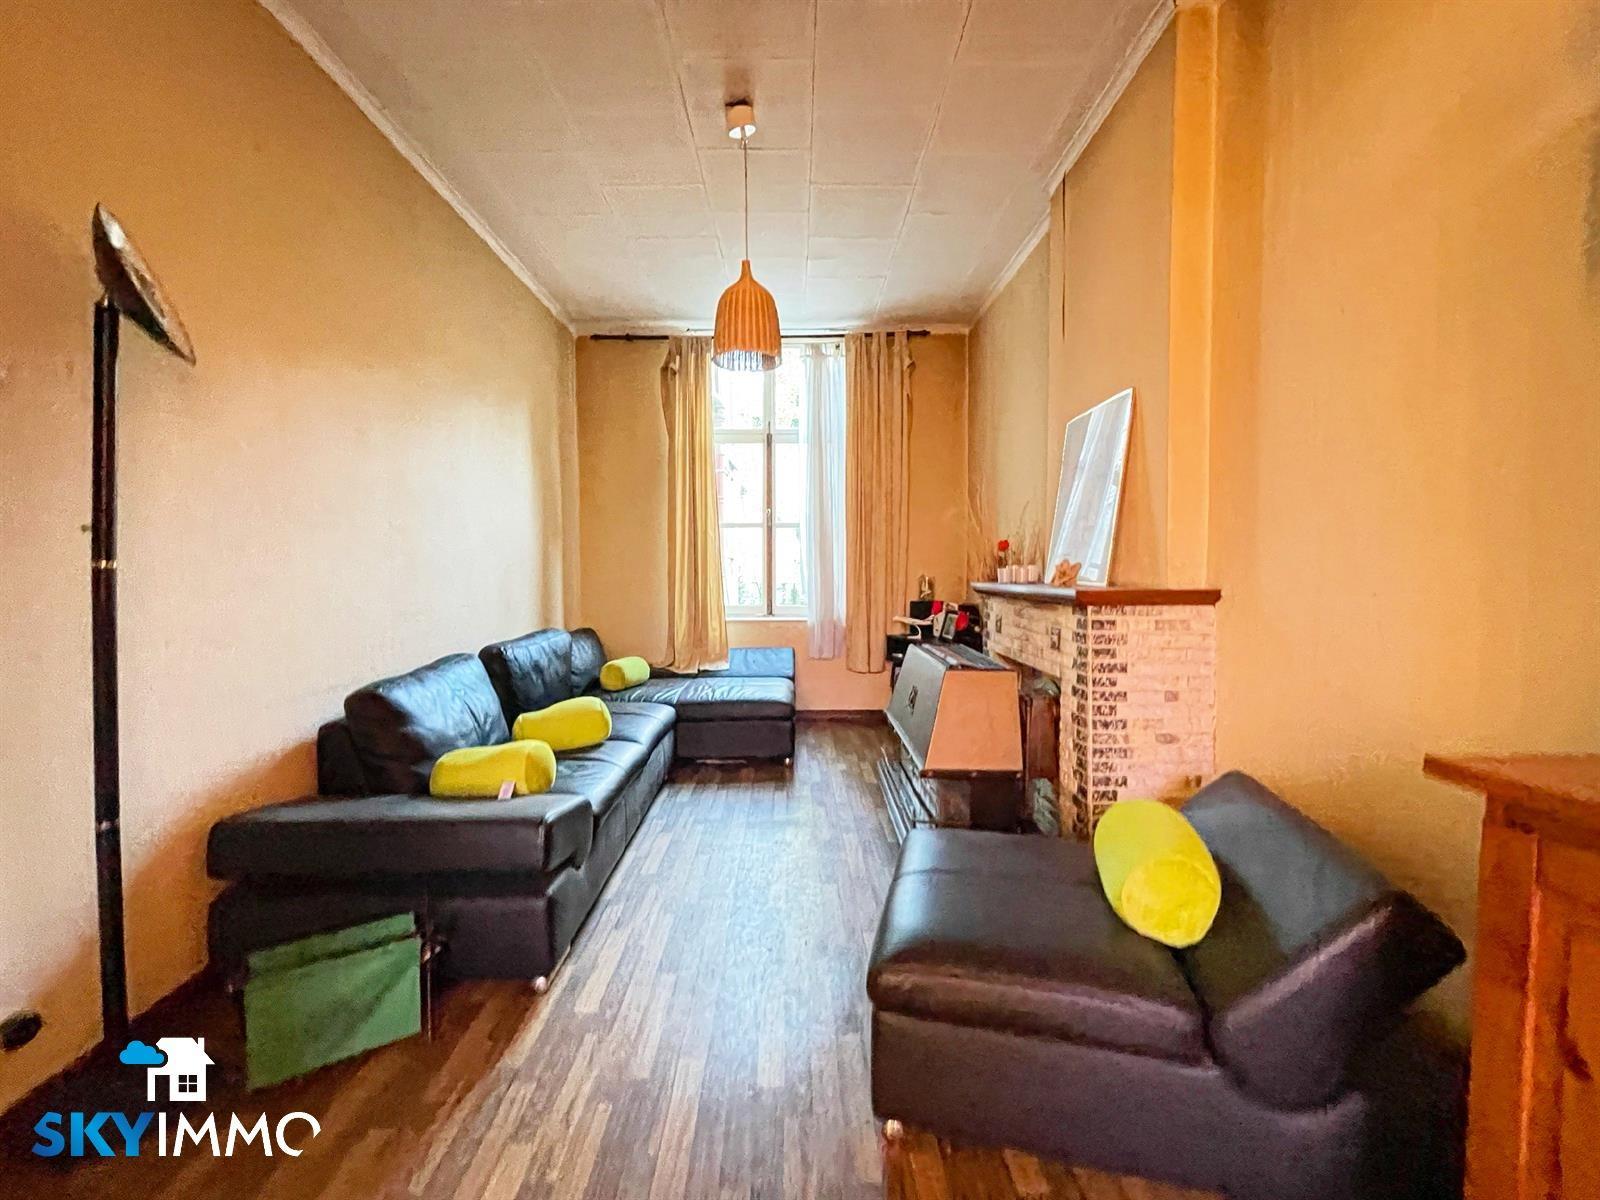 Maison - Seraing Jemeppesur-Meuse - #4383857-6